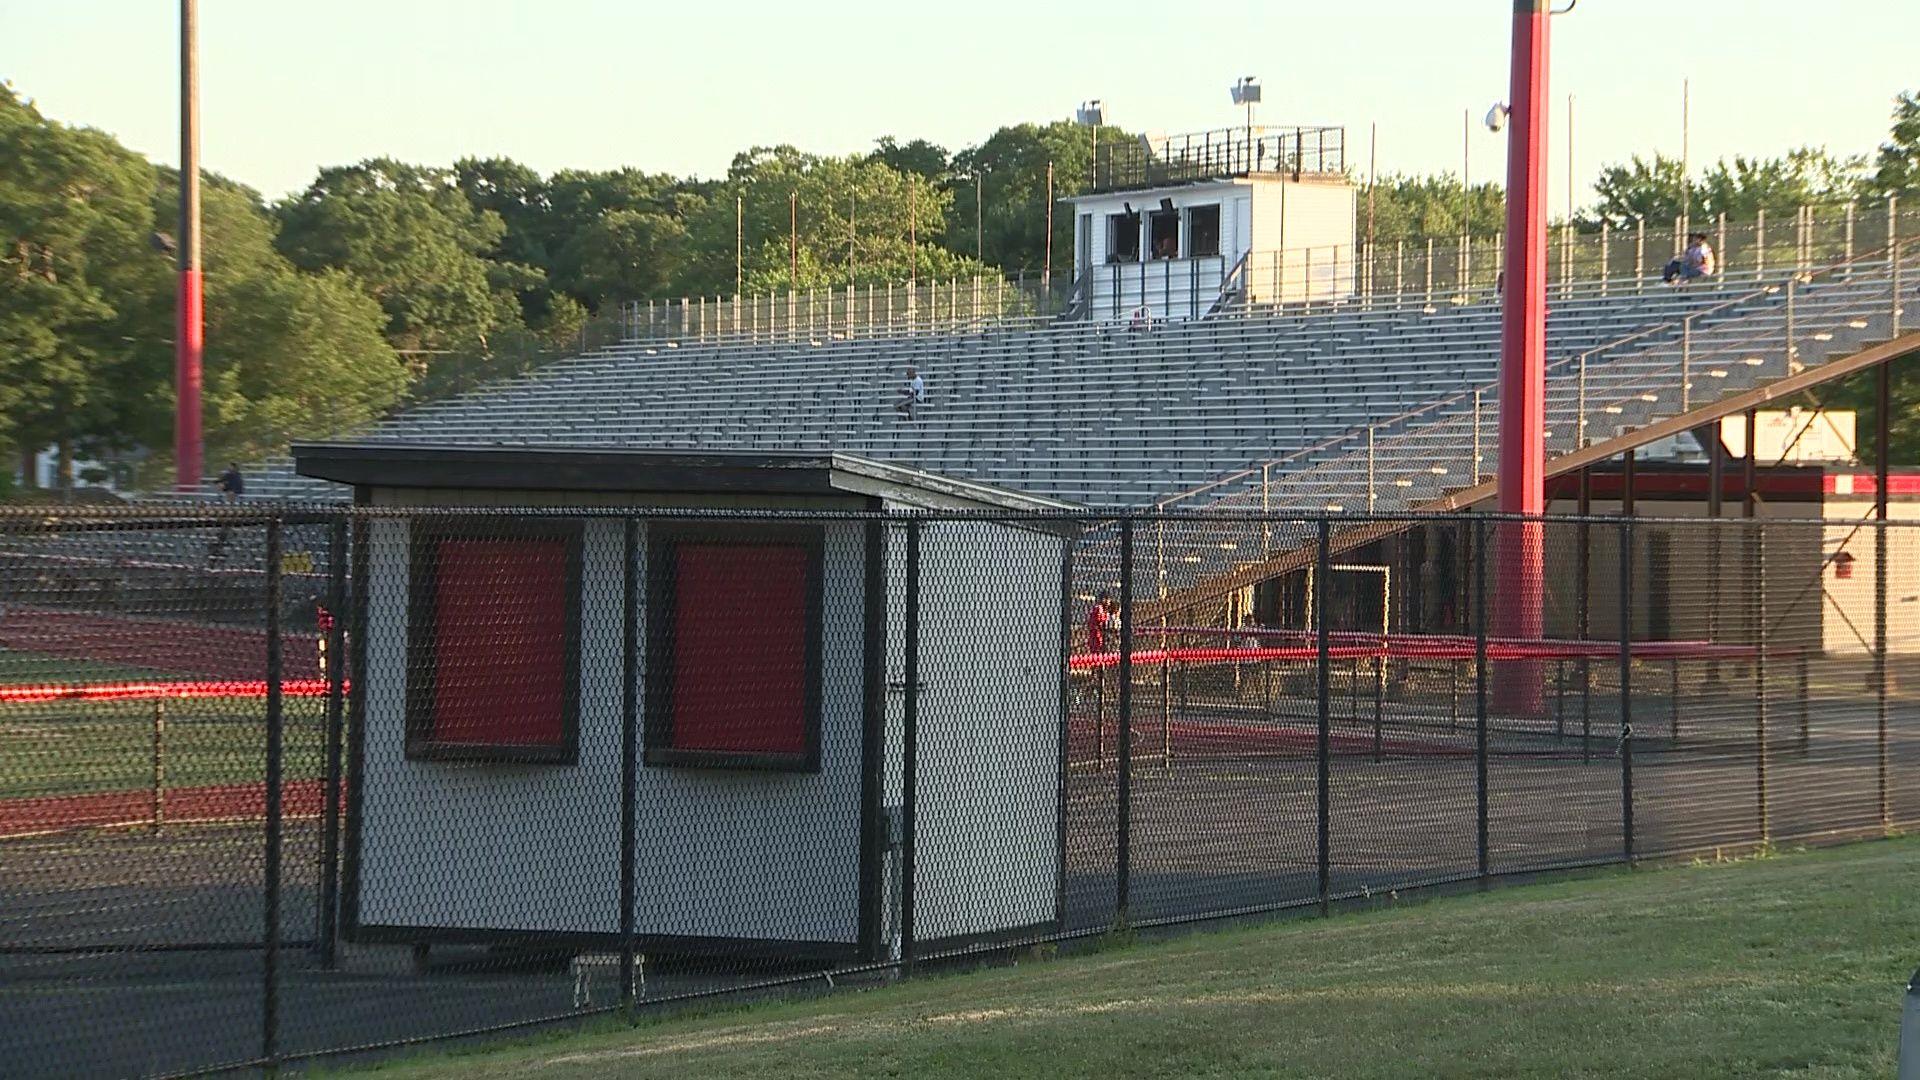 Brockton volunteer football coach charged with child rape